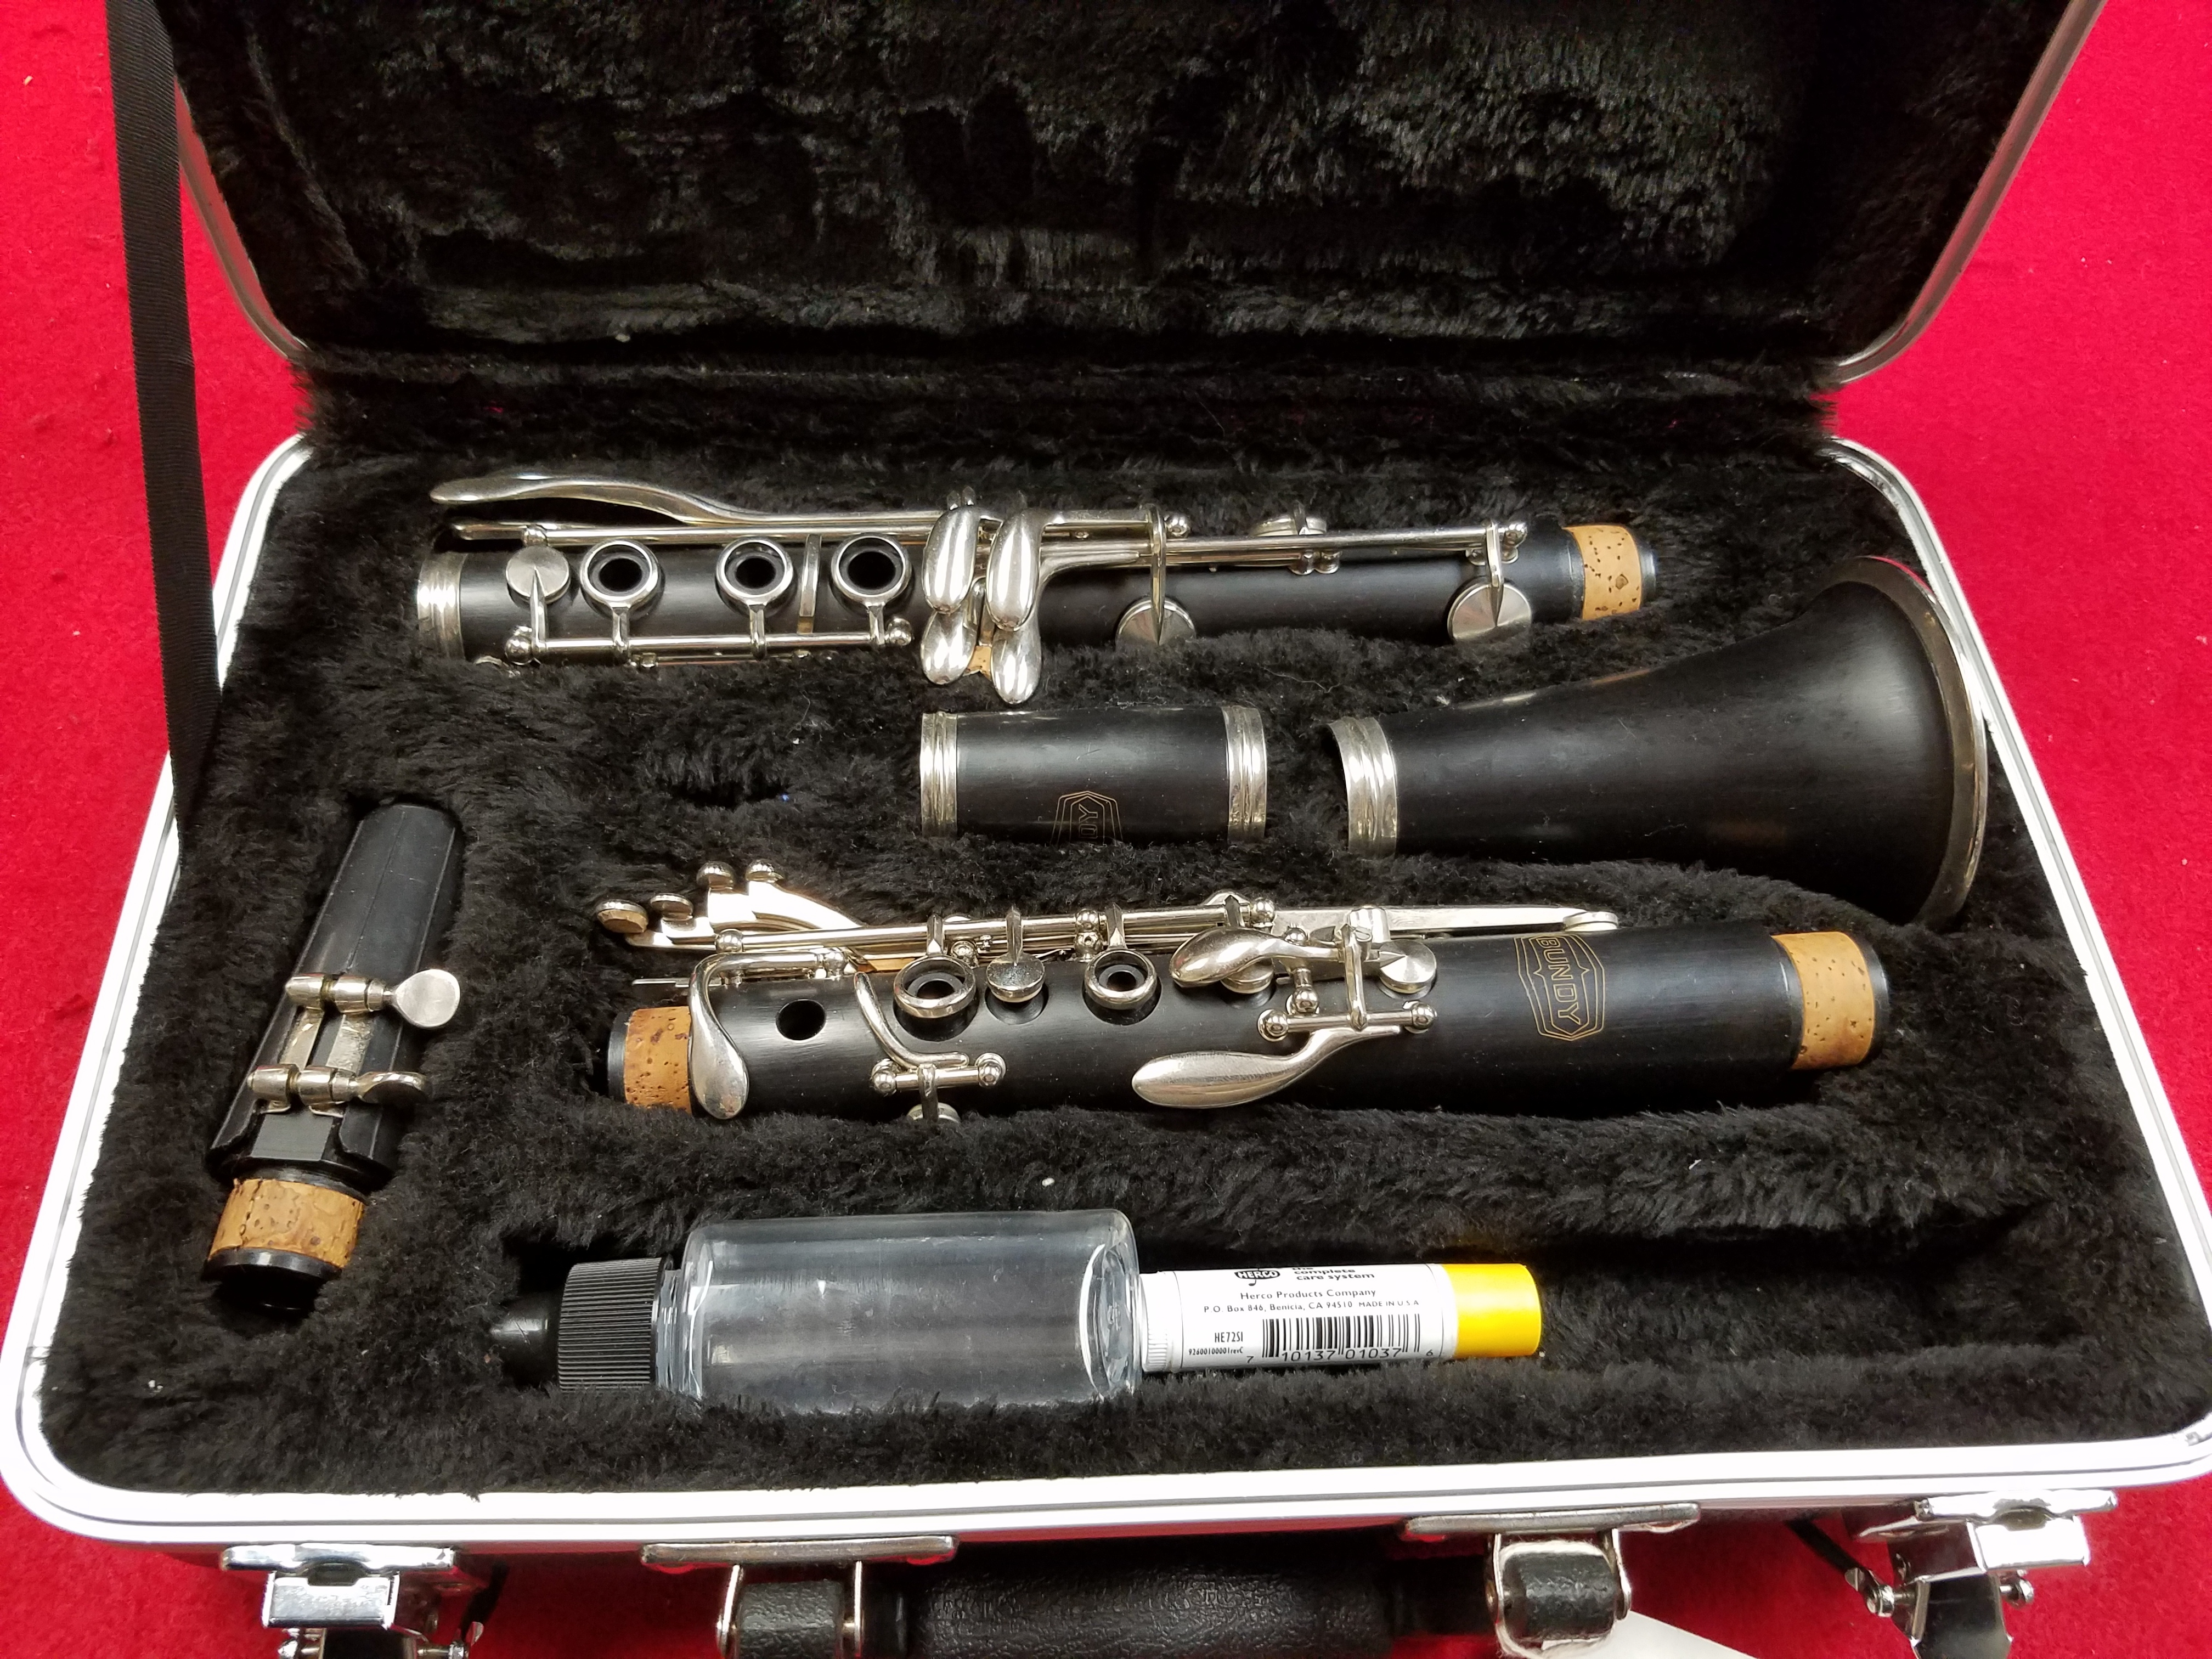 BUNDY - BCL-300 - CLARINET MUSICAL INSTRUMENT